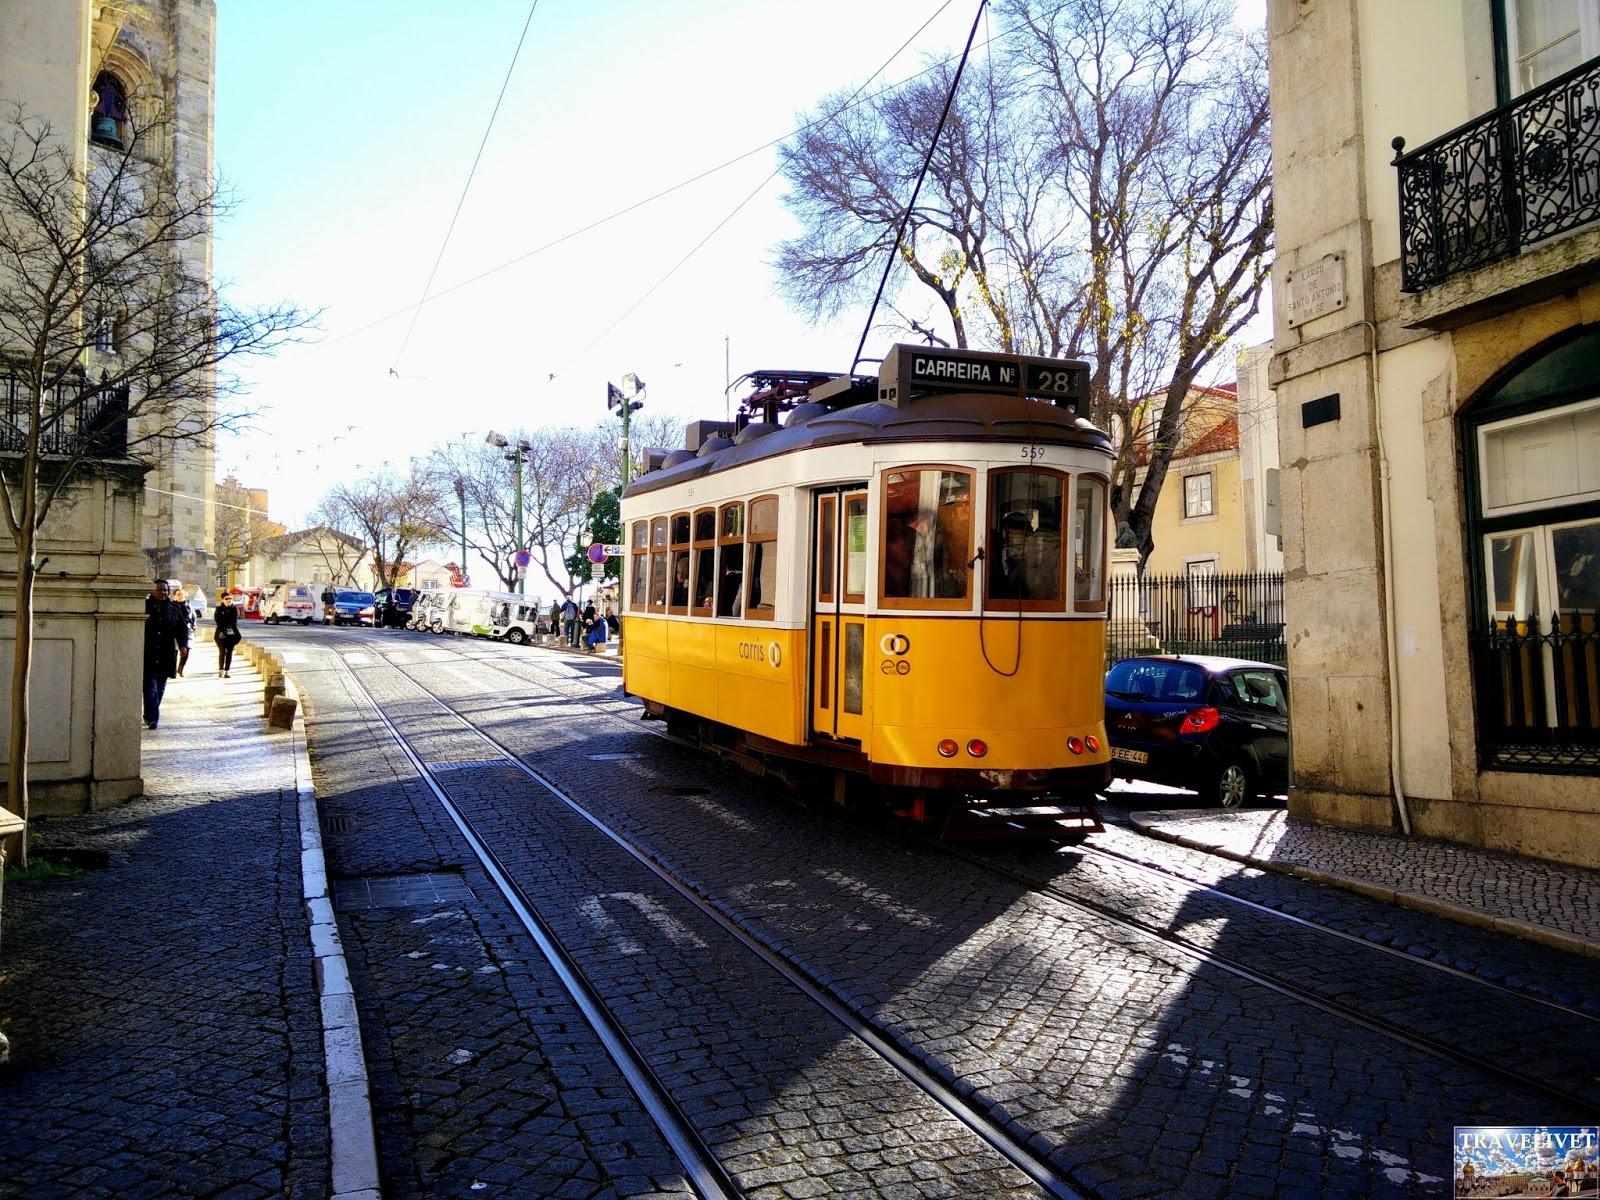 Portugal Lisbonne Lisboa tramway